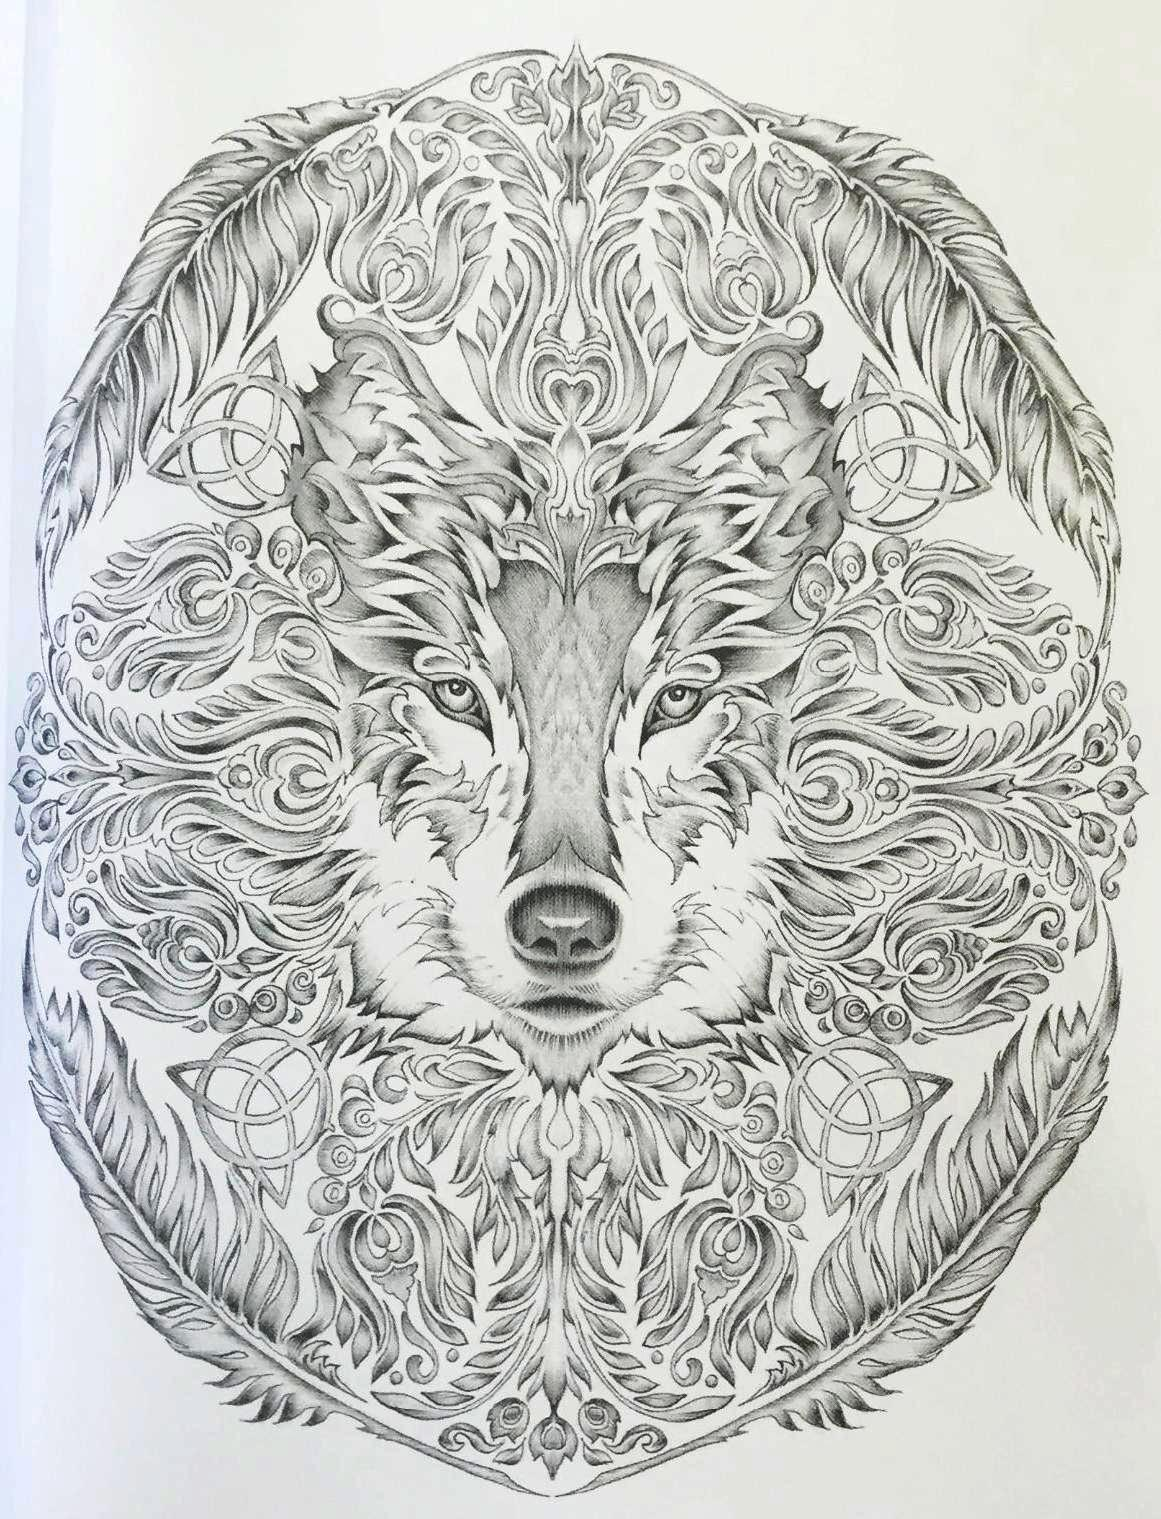 colour-my-sketchbook-colouring-book-fox